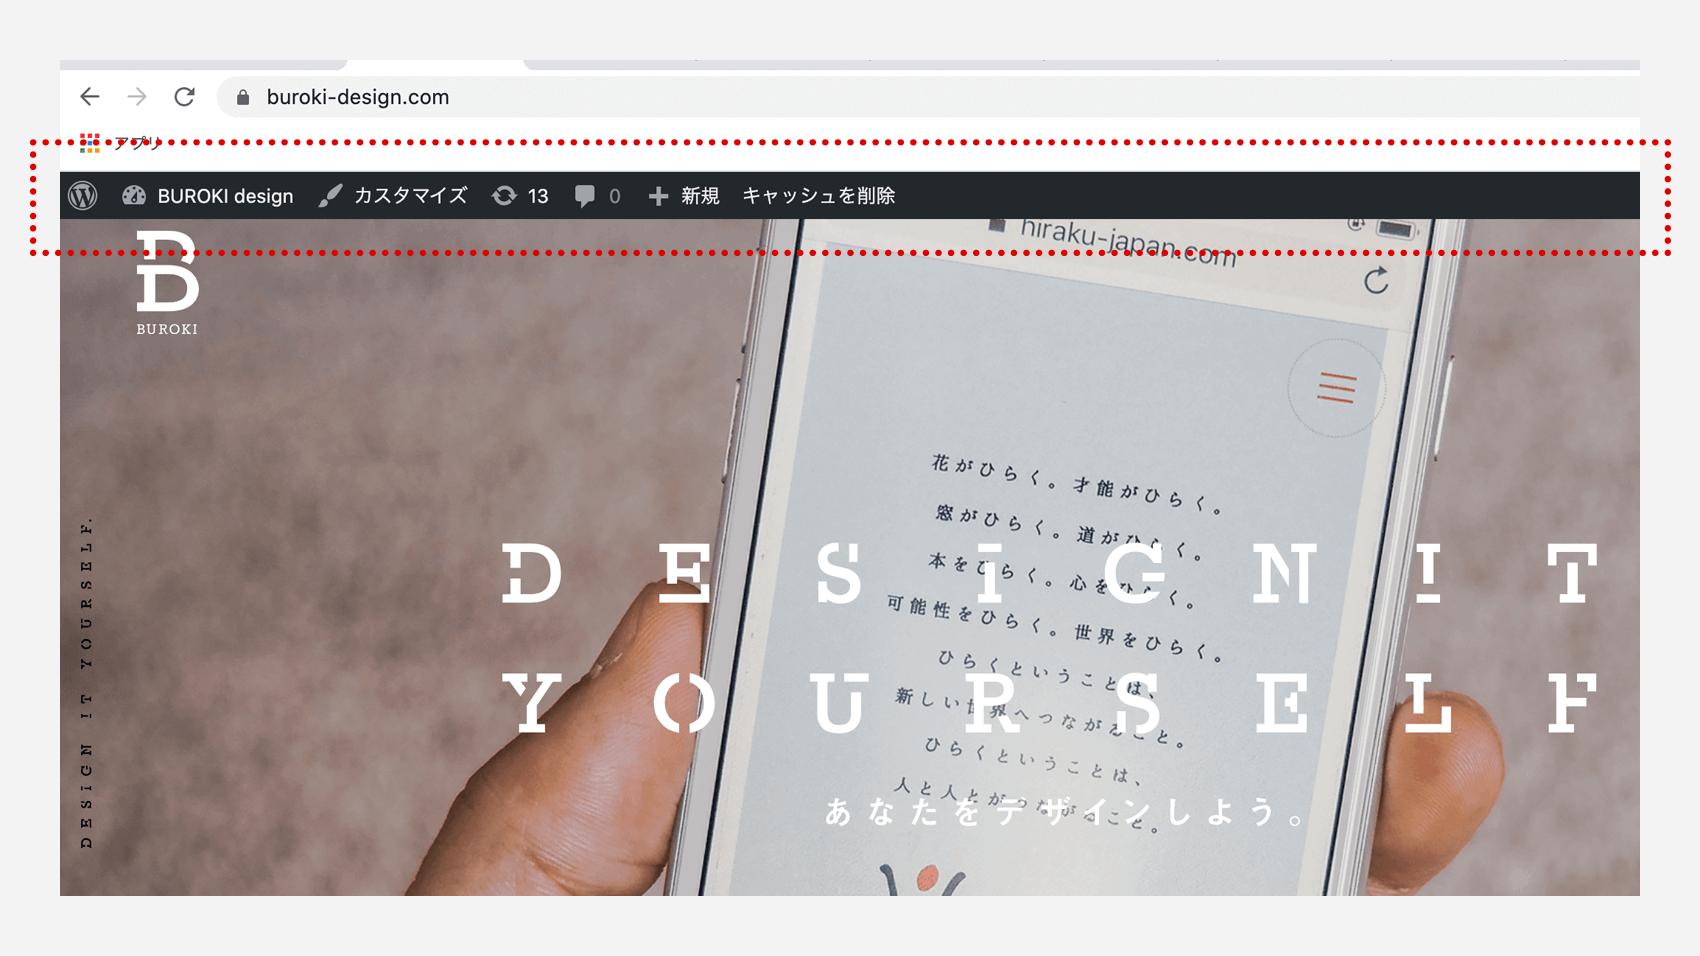 webサイト表示時に出るwordpressのツールバー